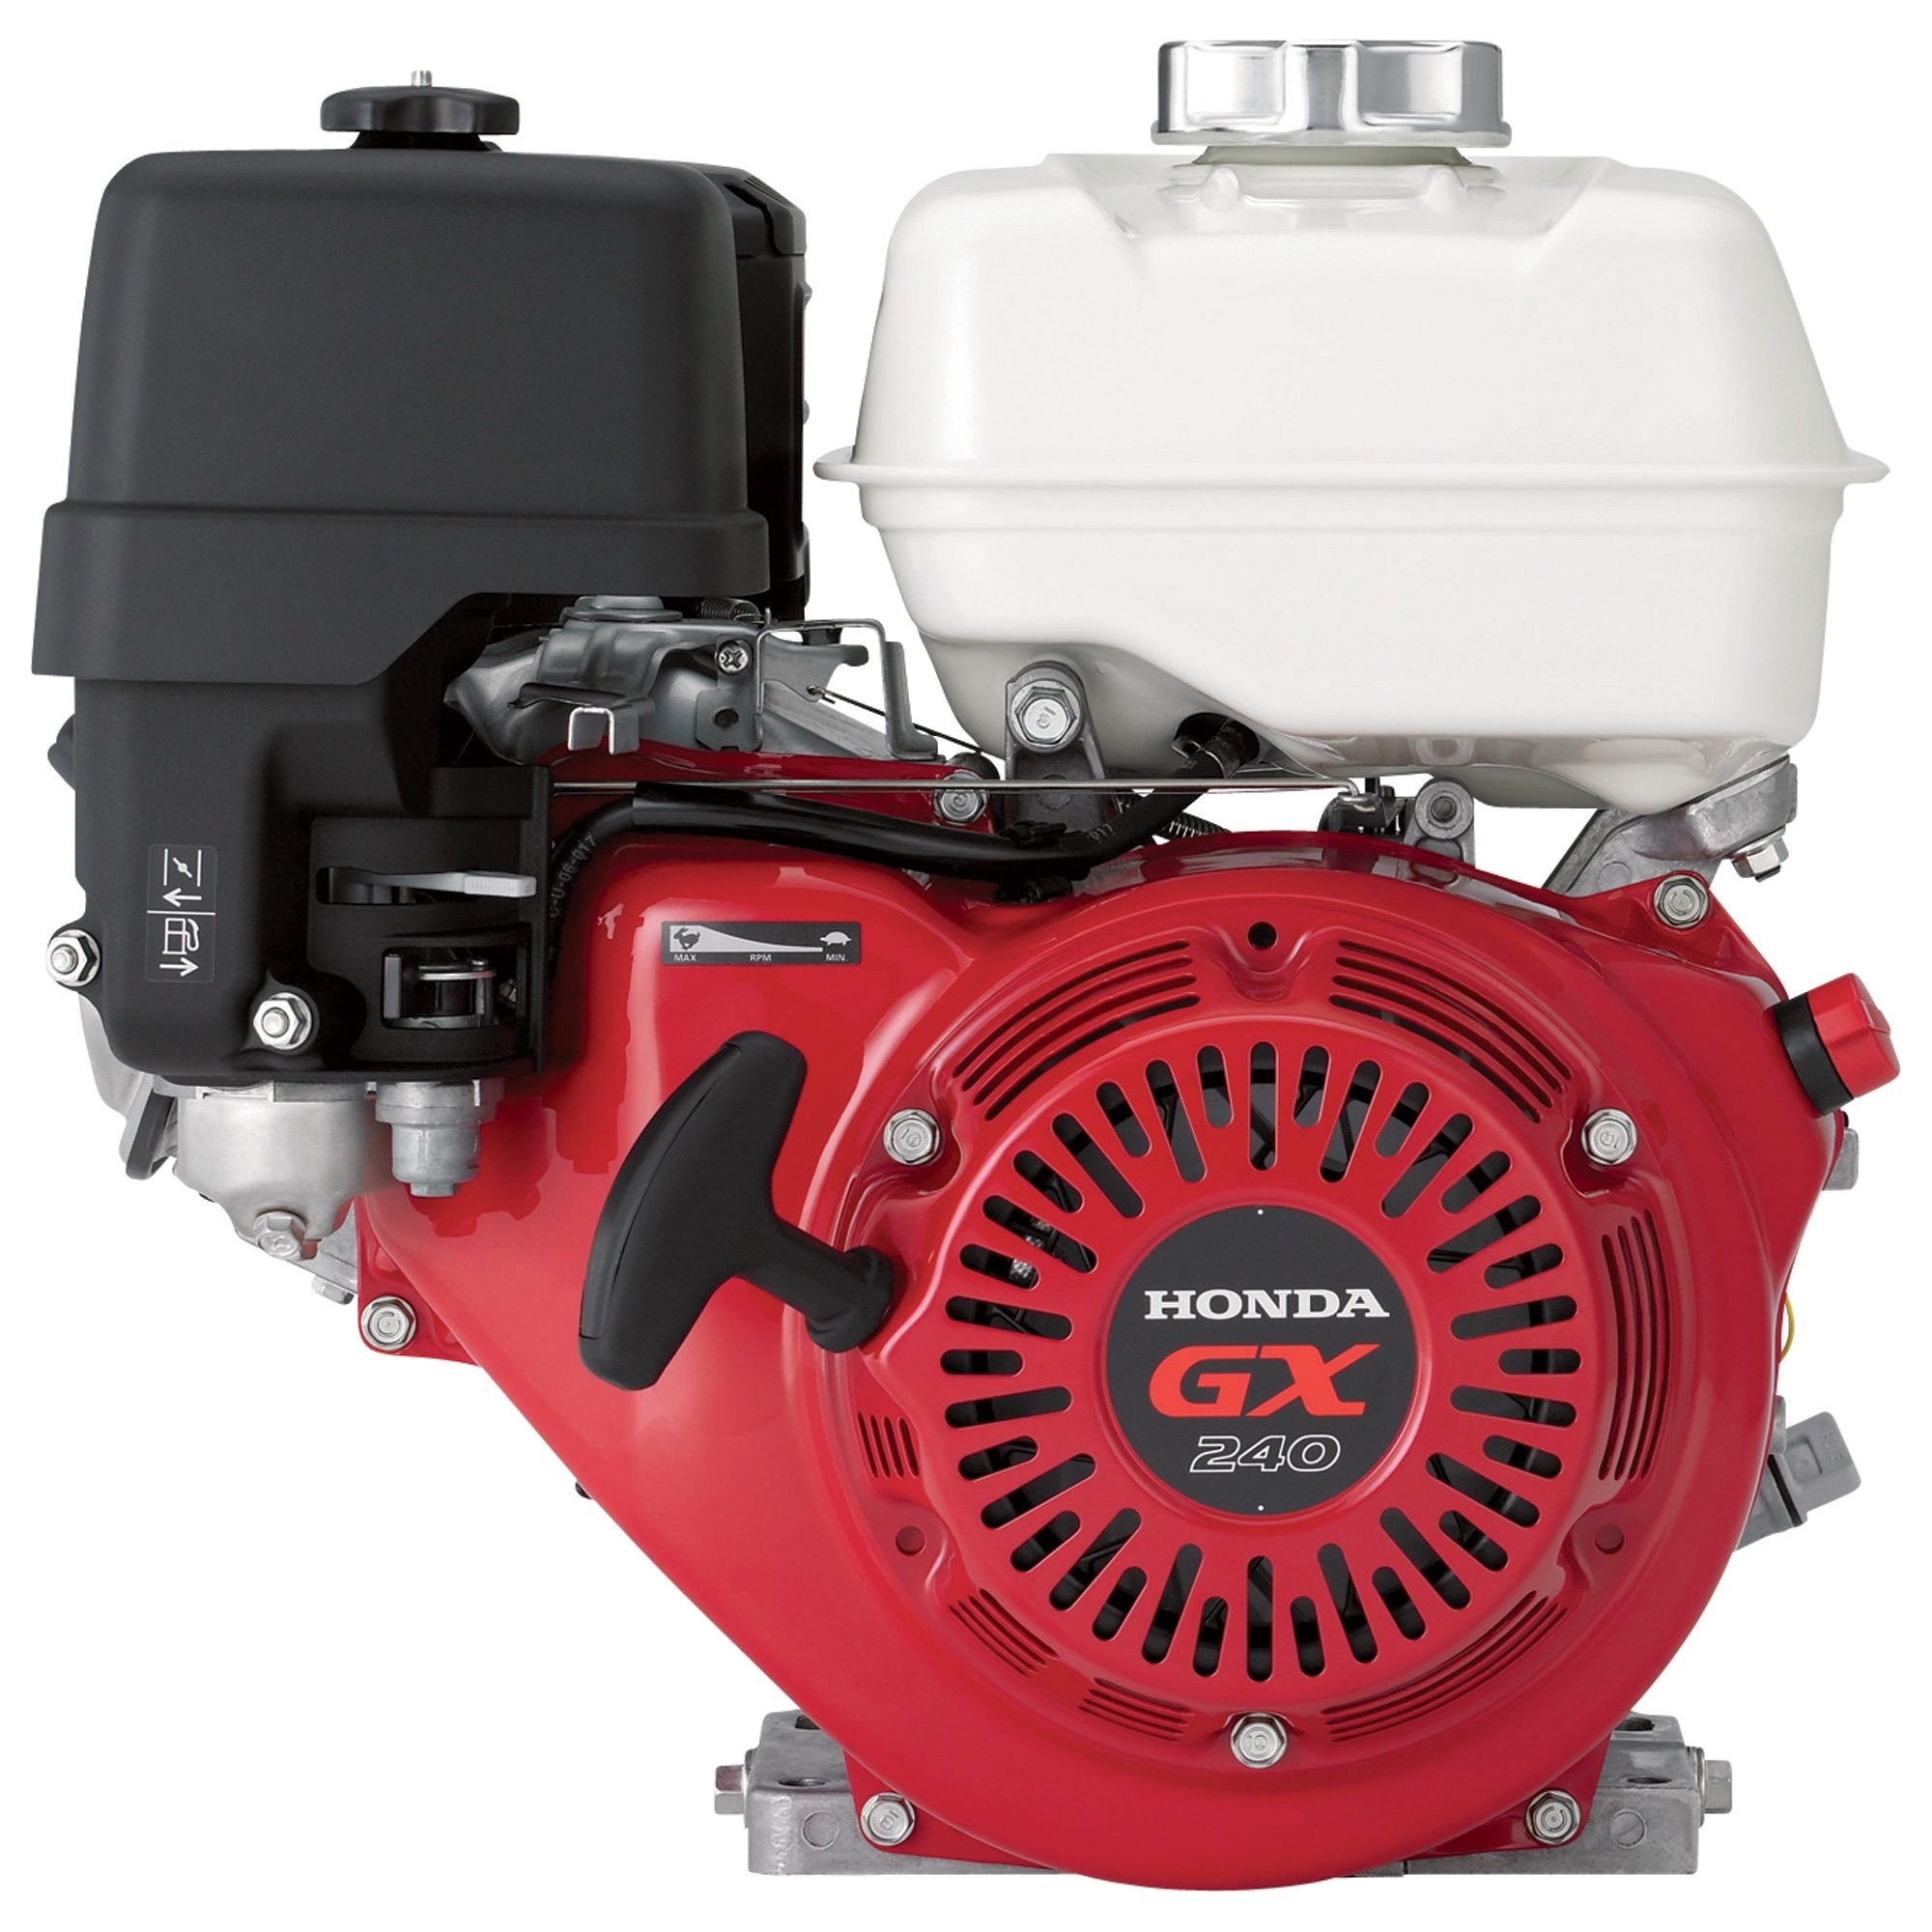 Honda Gx240 Parts Diagram Honda Horizontal Ohv Engine — 270cc Gx Series 1in X 3 31 64in Of Honda Gx240 Parts Diagram Snapper Series 15 Rear Engine Rider Parts Manual